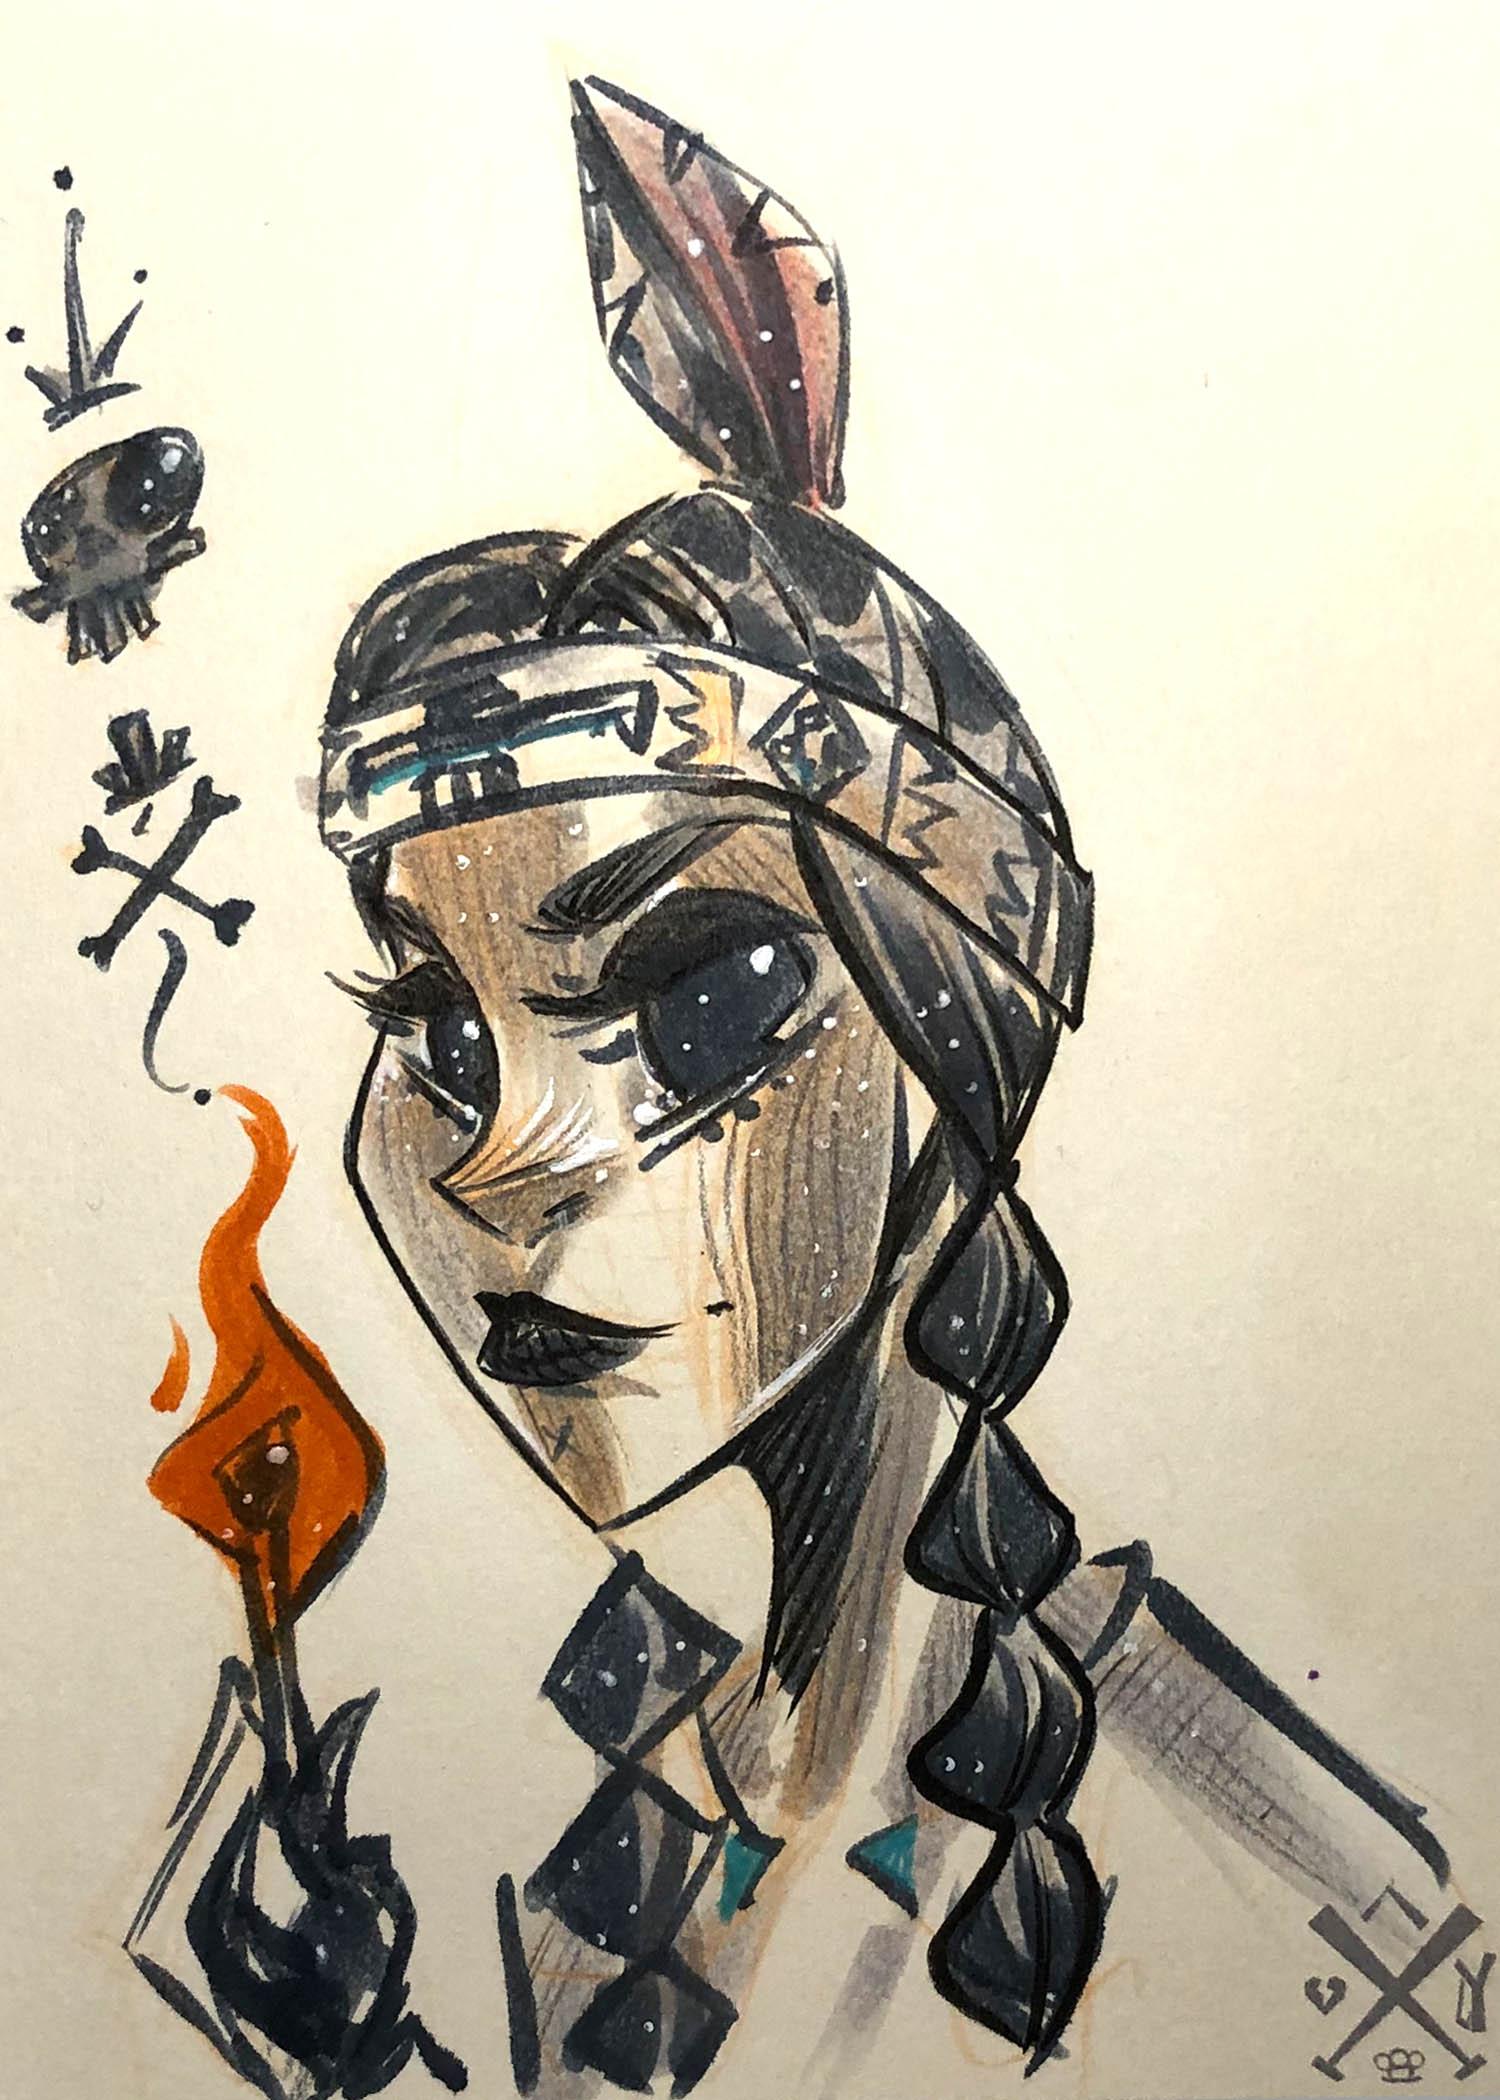 original sketch smoke cards illustrations from nooligan. (super rare pull) - Original sketch cards